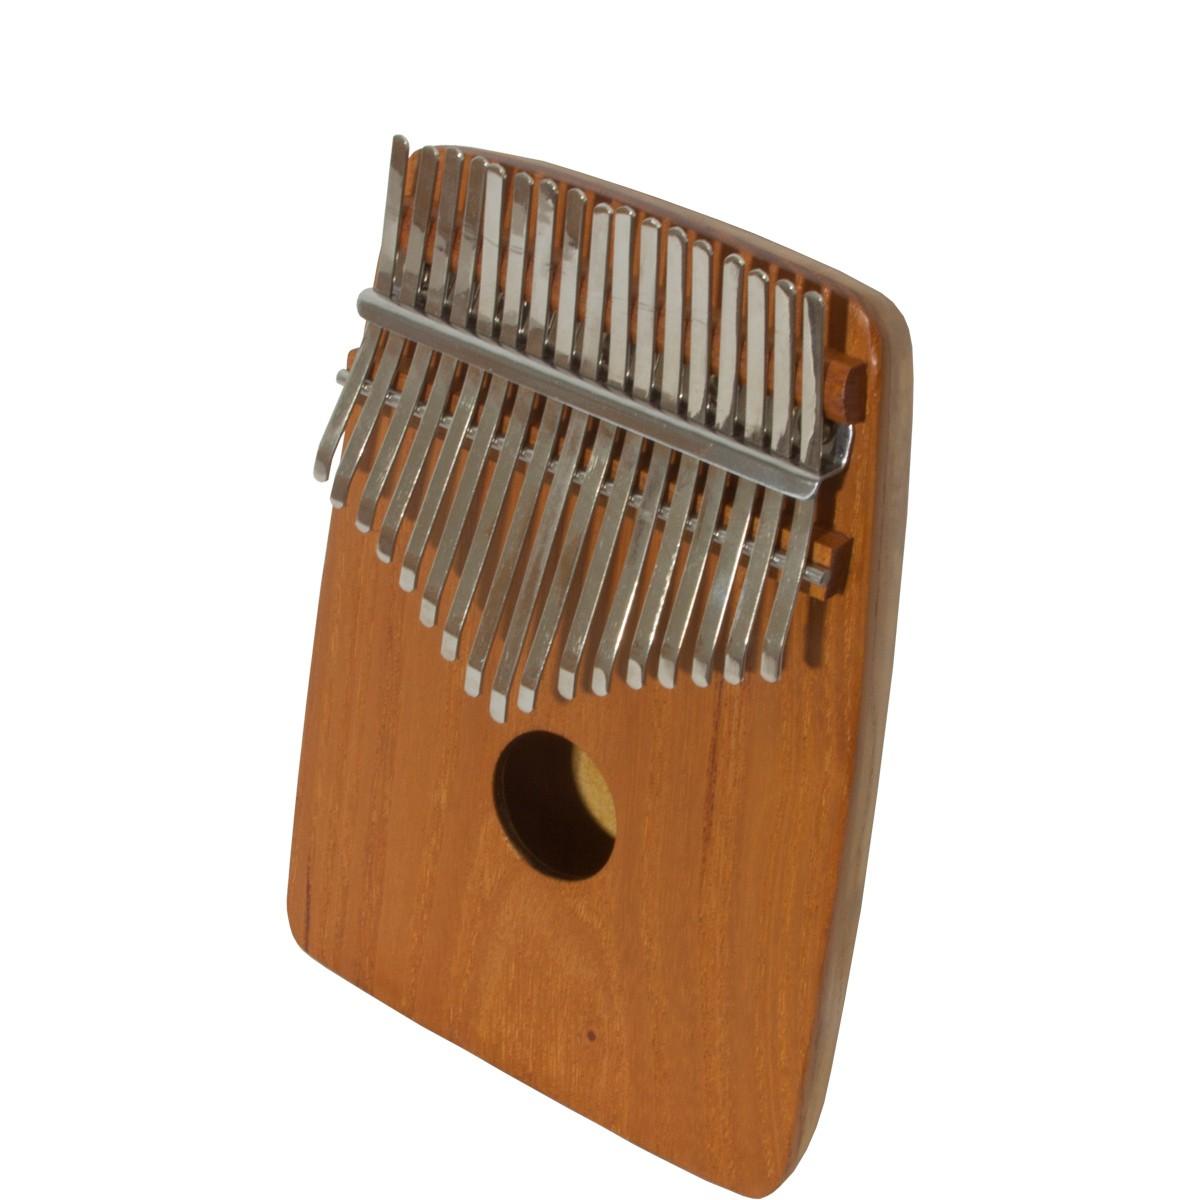 DOBANI 17-Key Thumb Piano w/ Rounded Back - Red Cedar